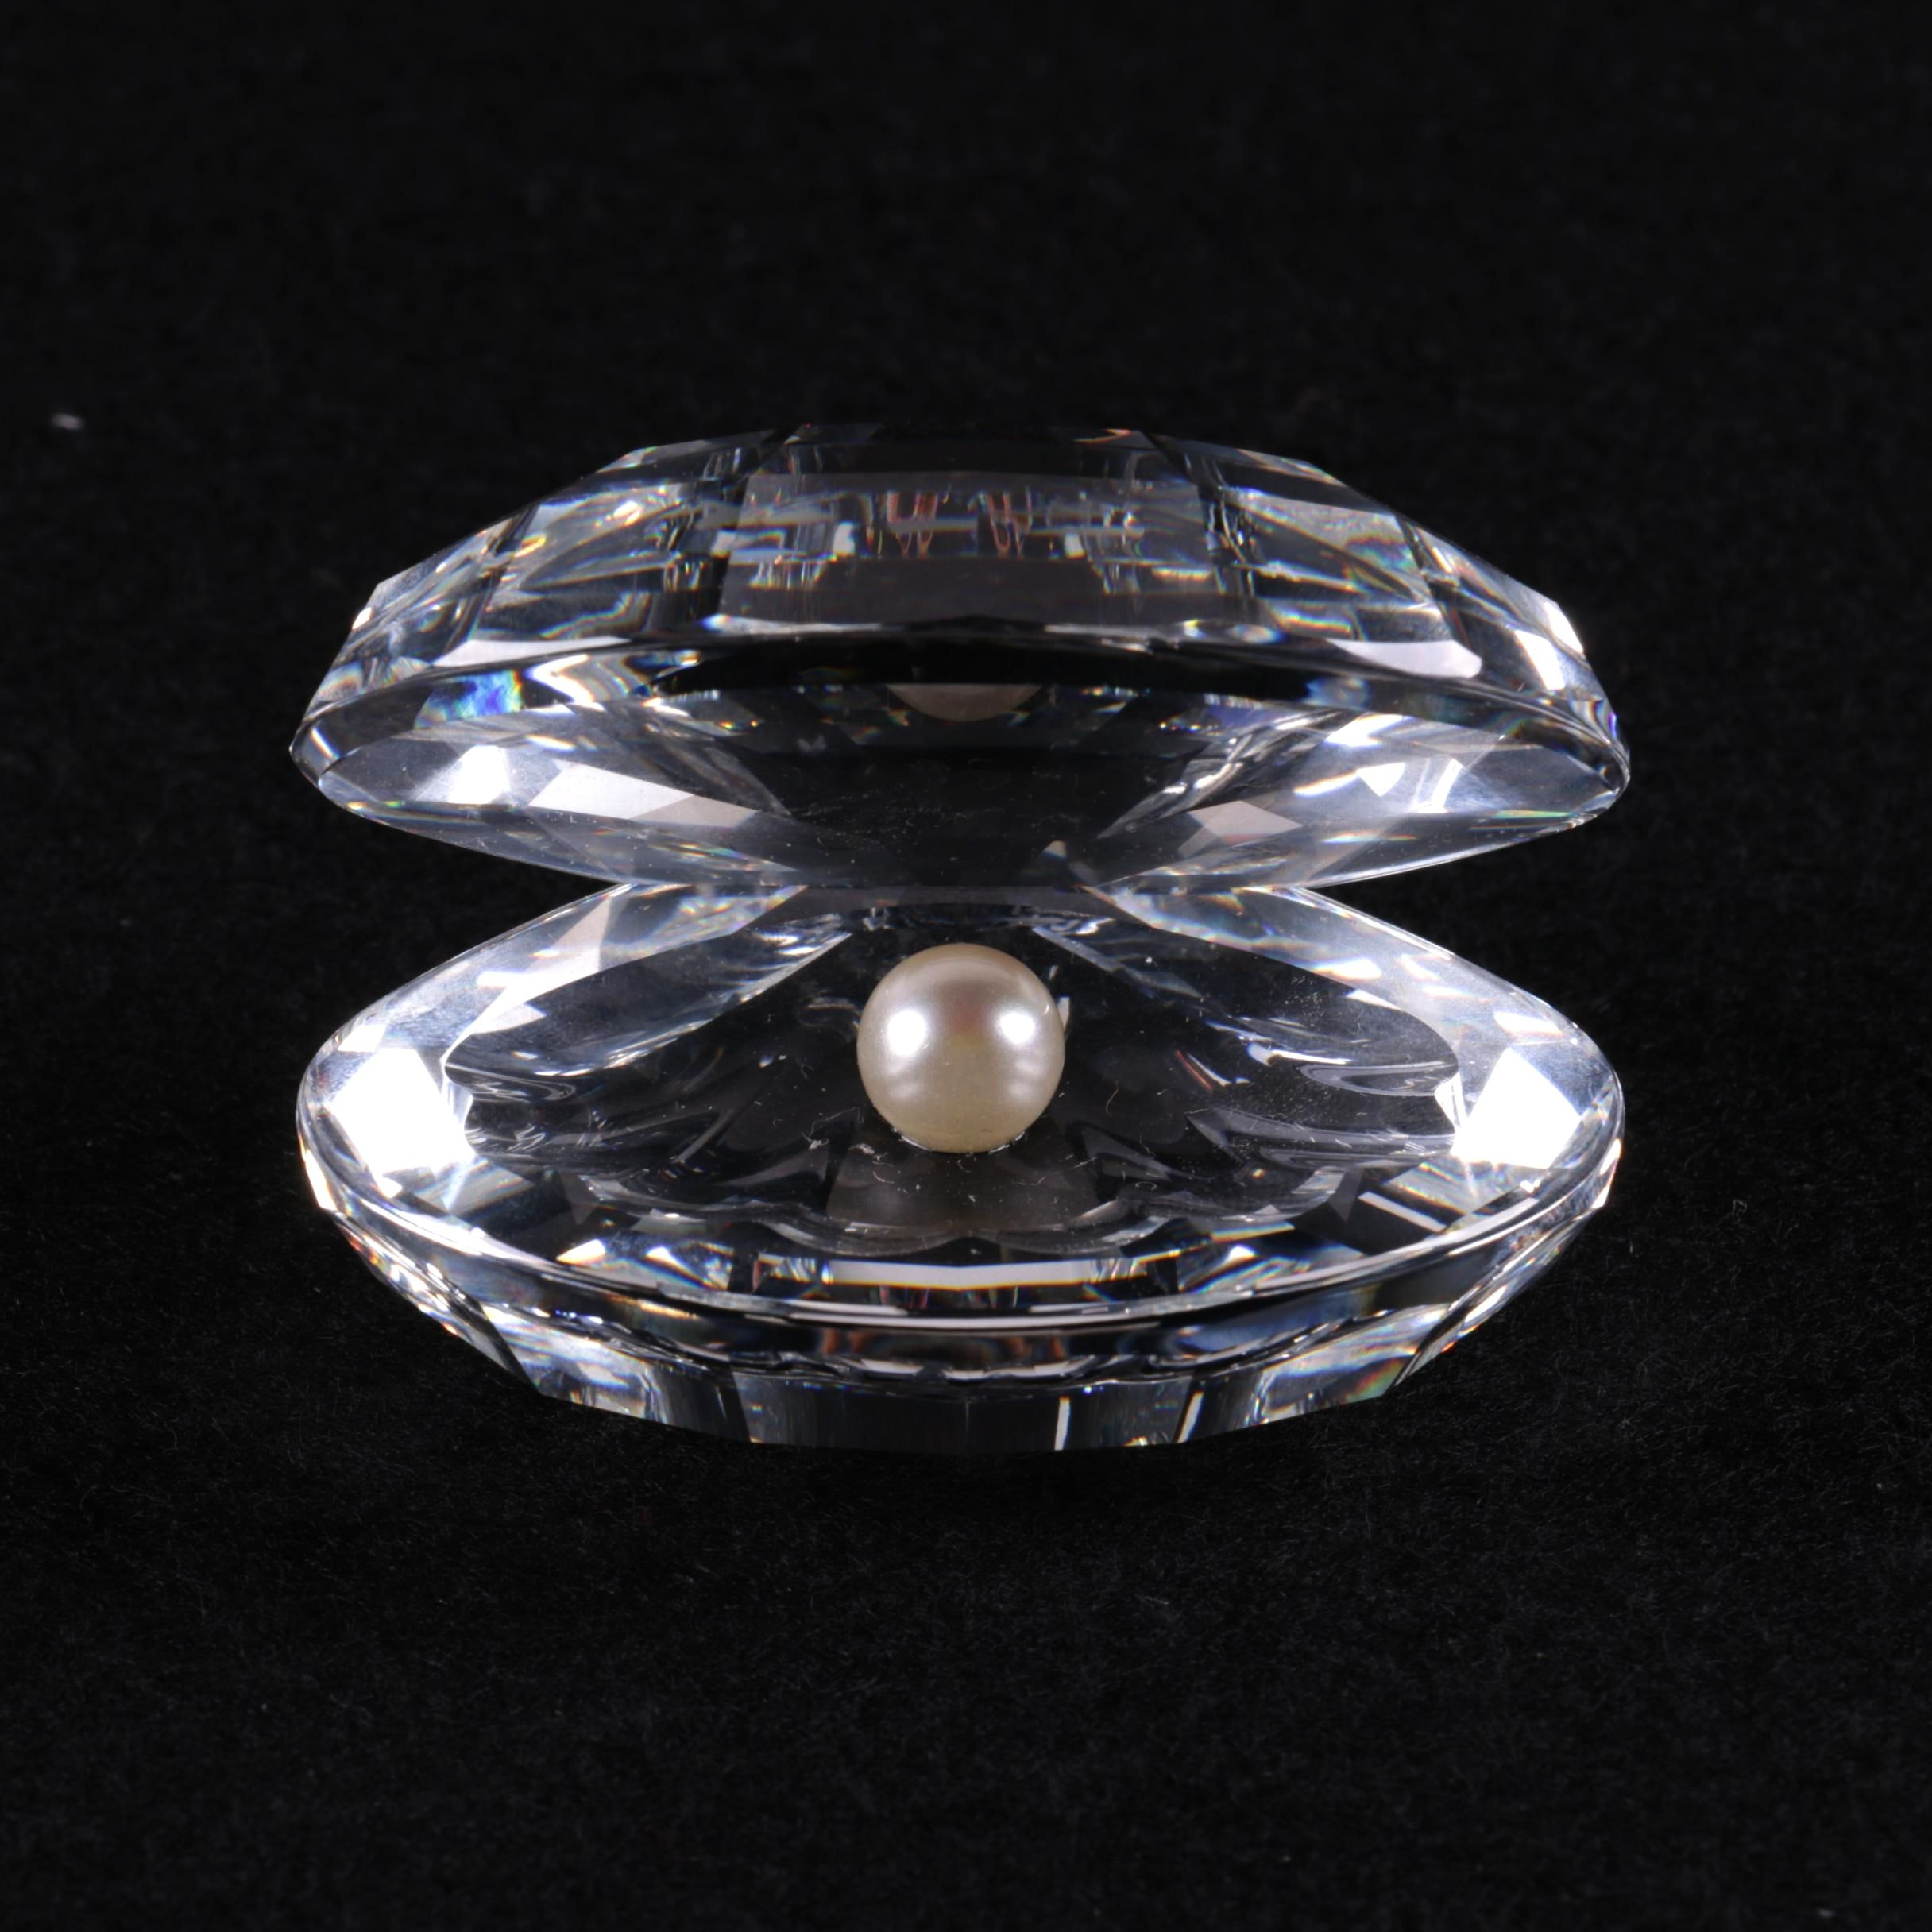 Swarovski Crystal Clam with Pearl Figurine